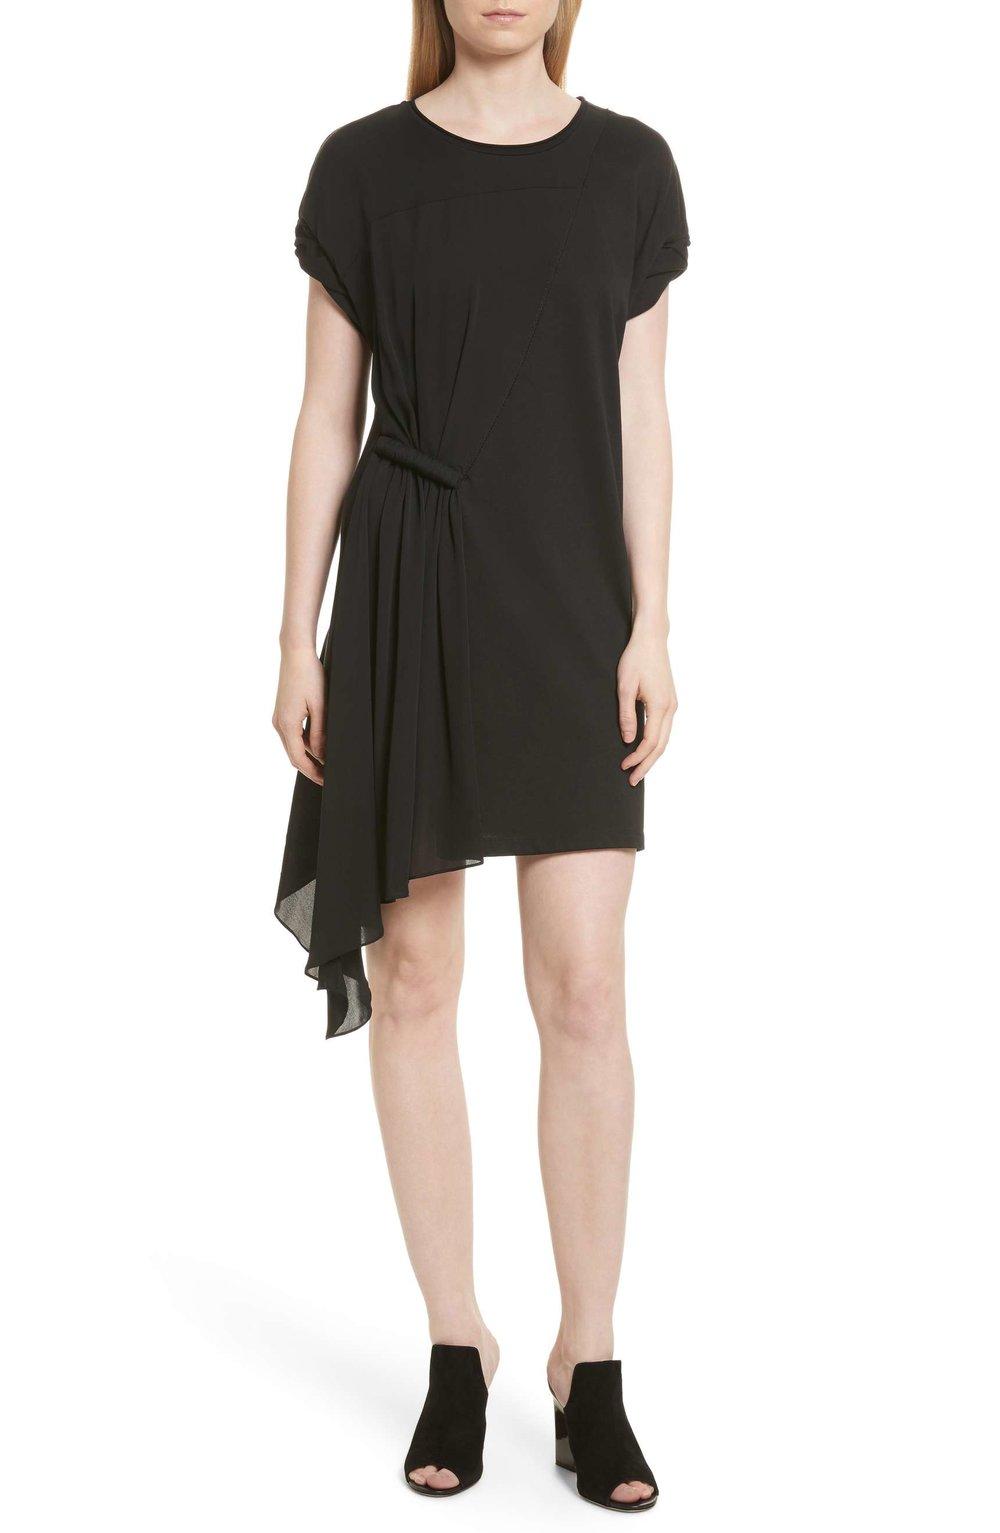 PHILIP LIM Gathered waist dress, $375 Nordstrom.com